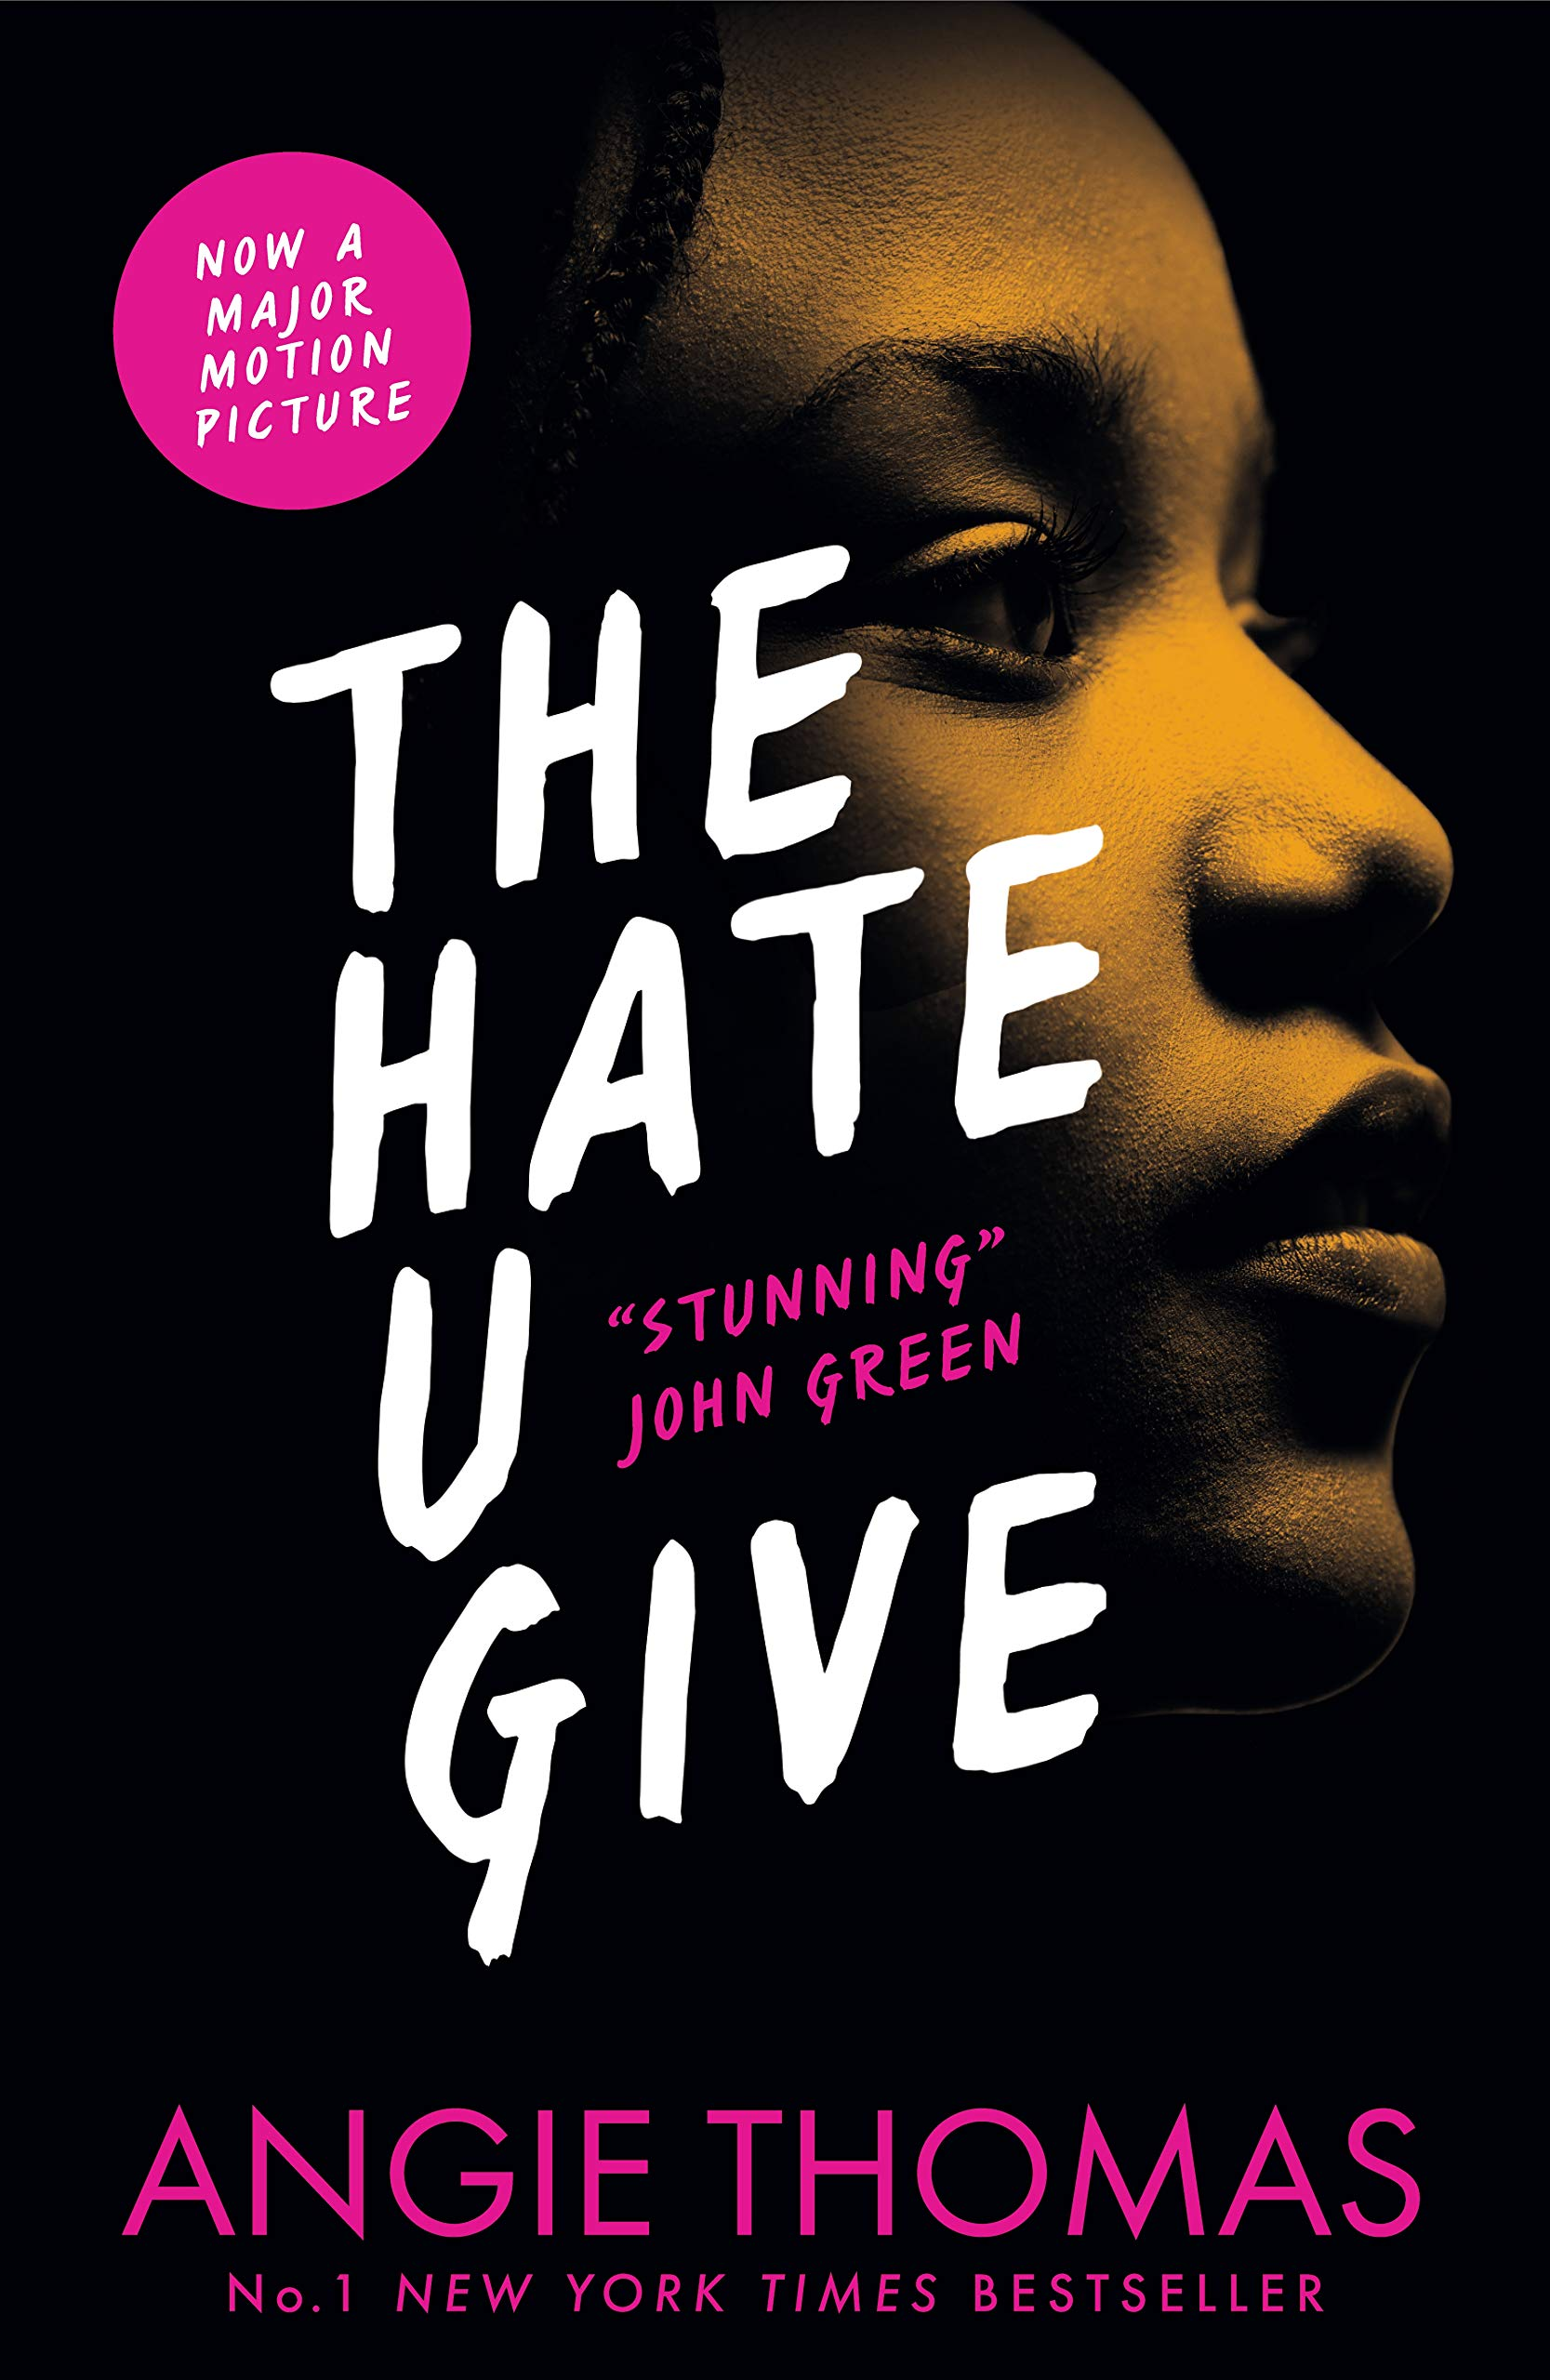 The Hate U Give: Amazon.co.uk: Thomas, Angie: Books